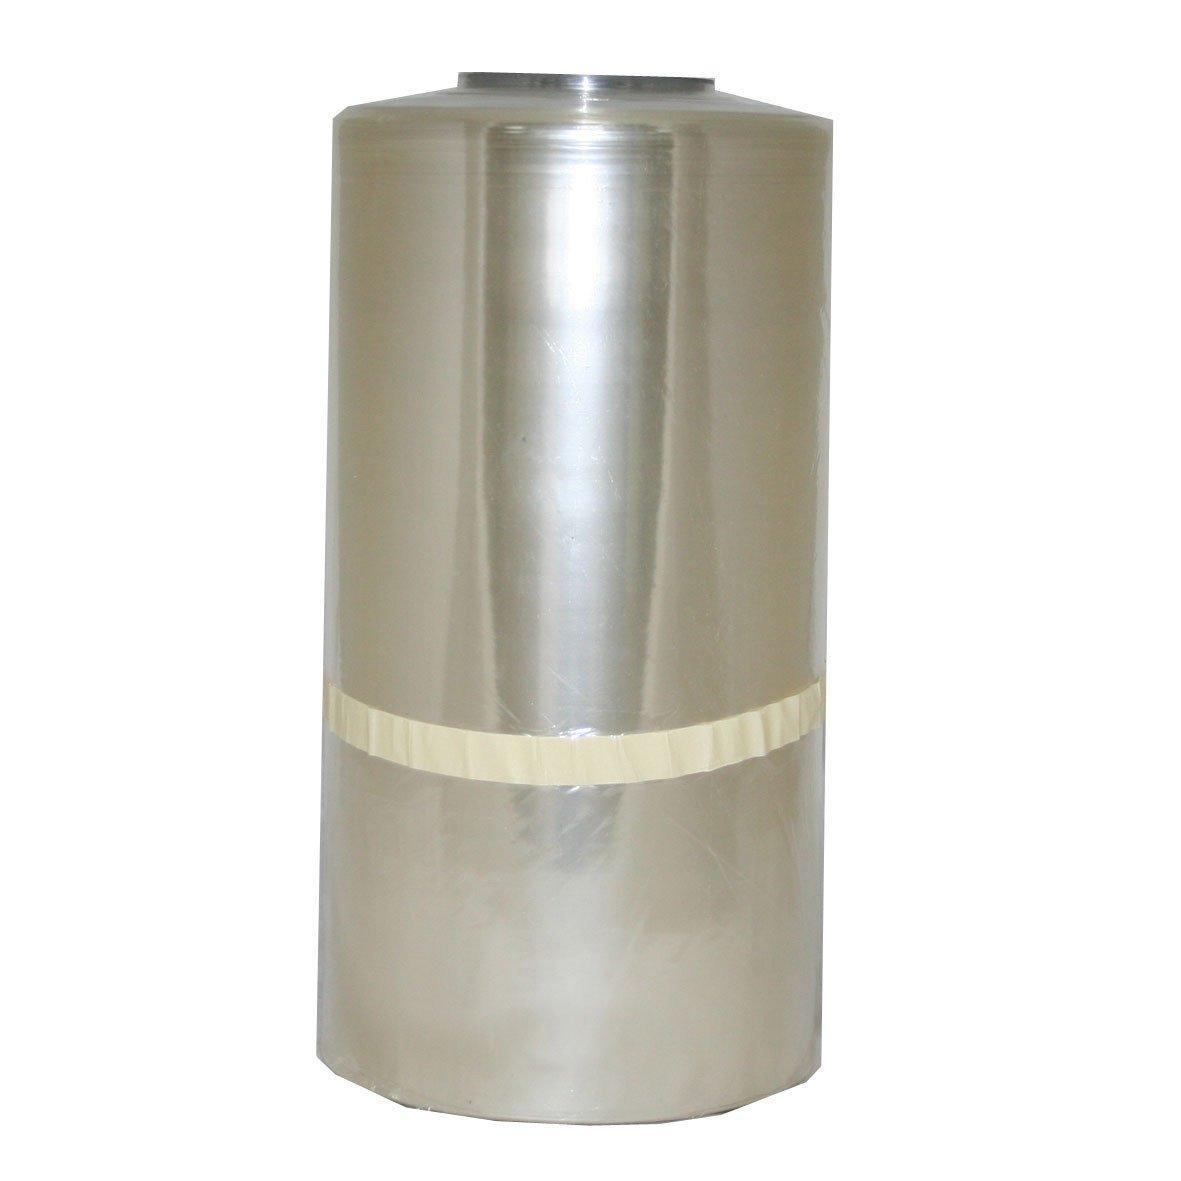 Плёнка термоусадочная полурукав ПВХ 300/600мм х 650м, 12,5мкм, шампань